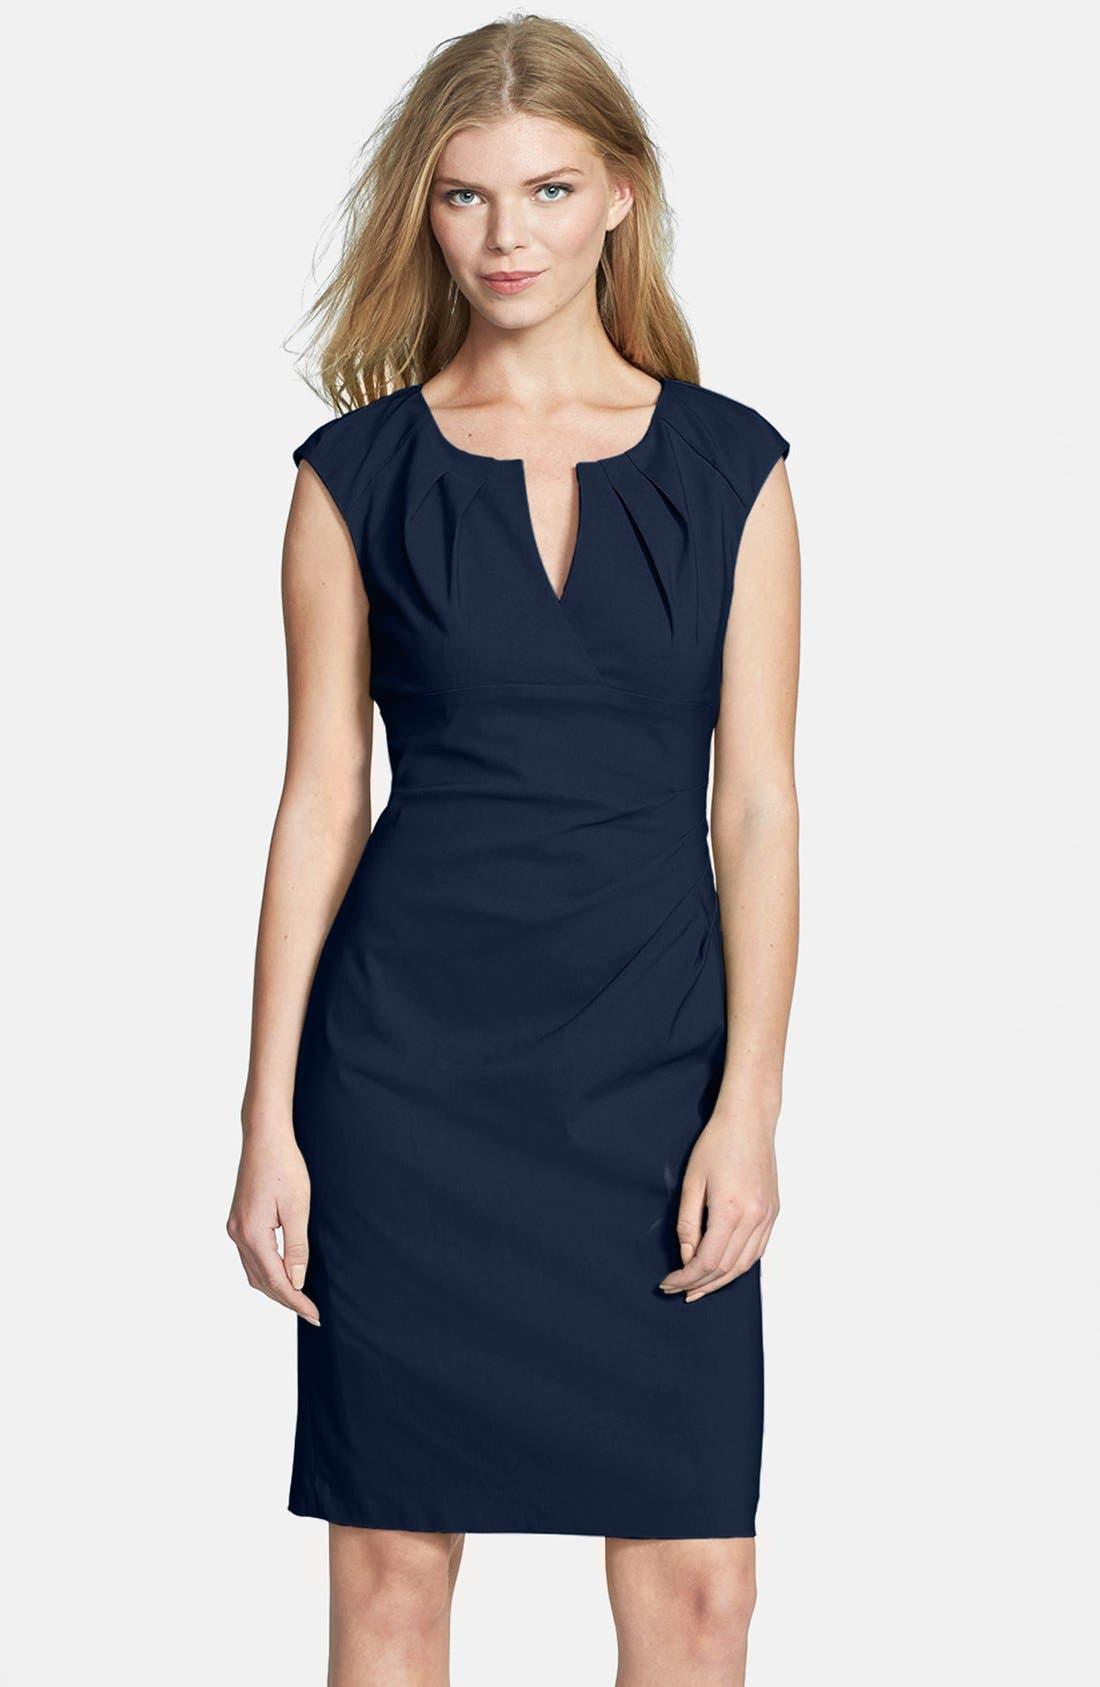 Alternate Image 1 Selected - Adrianna Papell Side Pleat Sheath Dress (Regular & Petite)